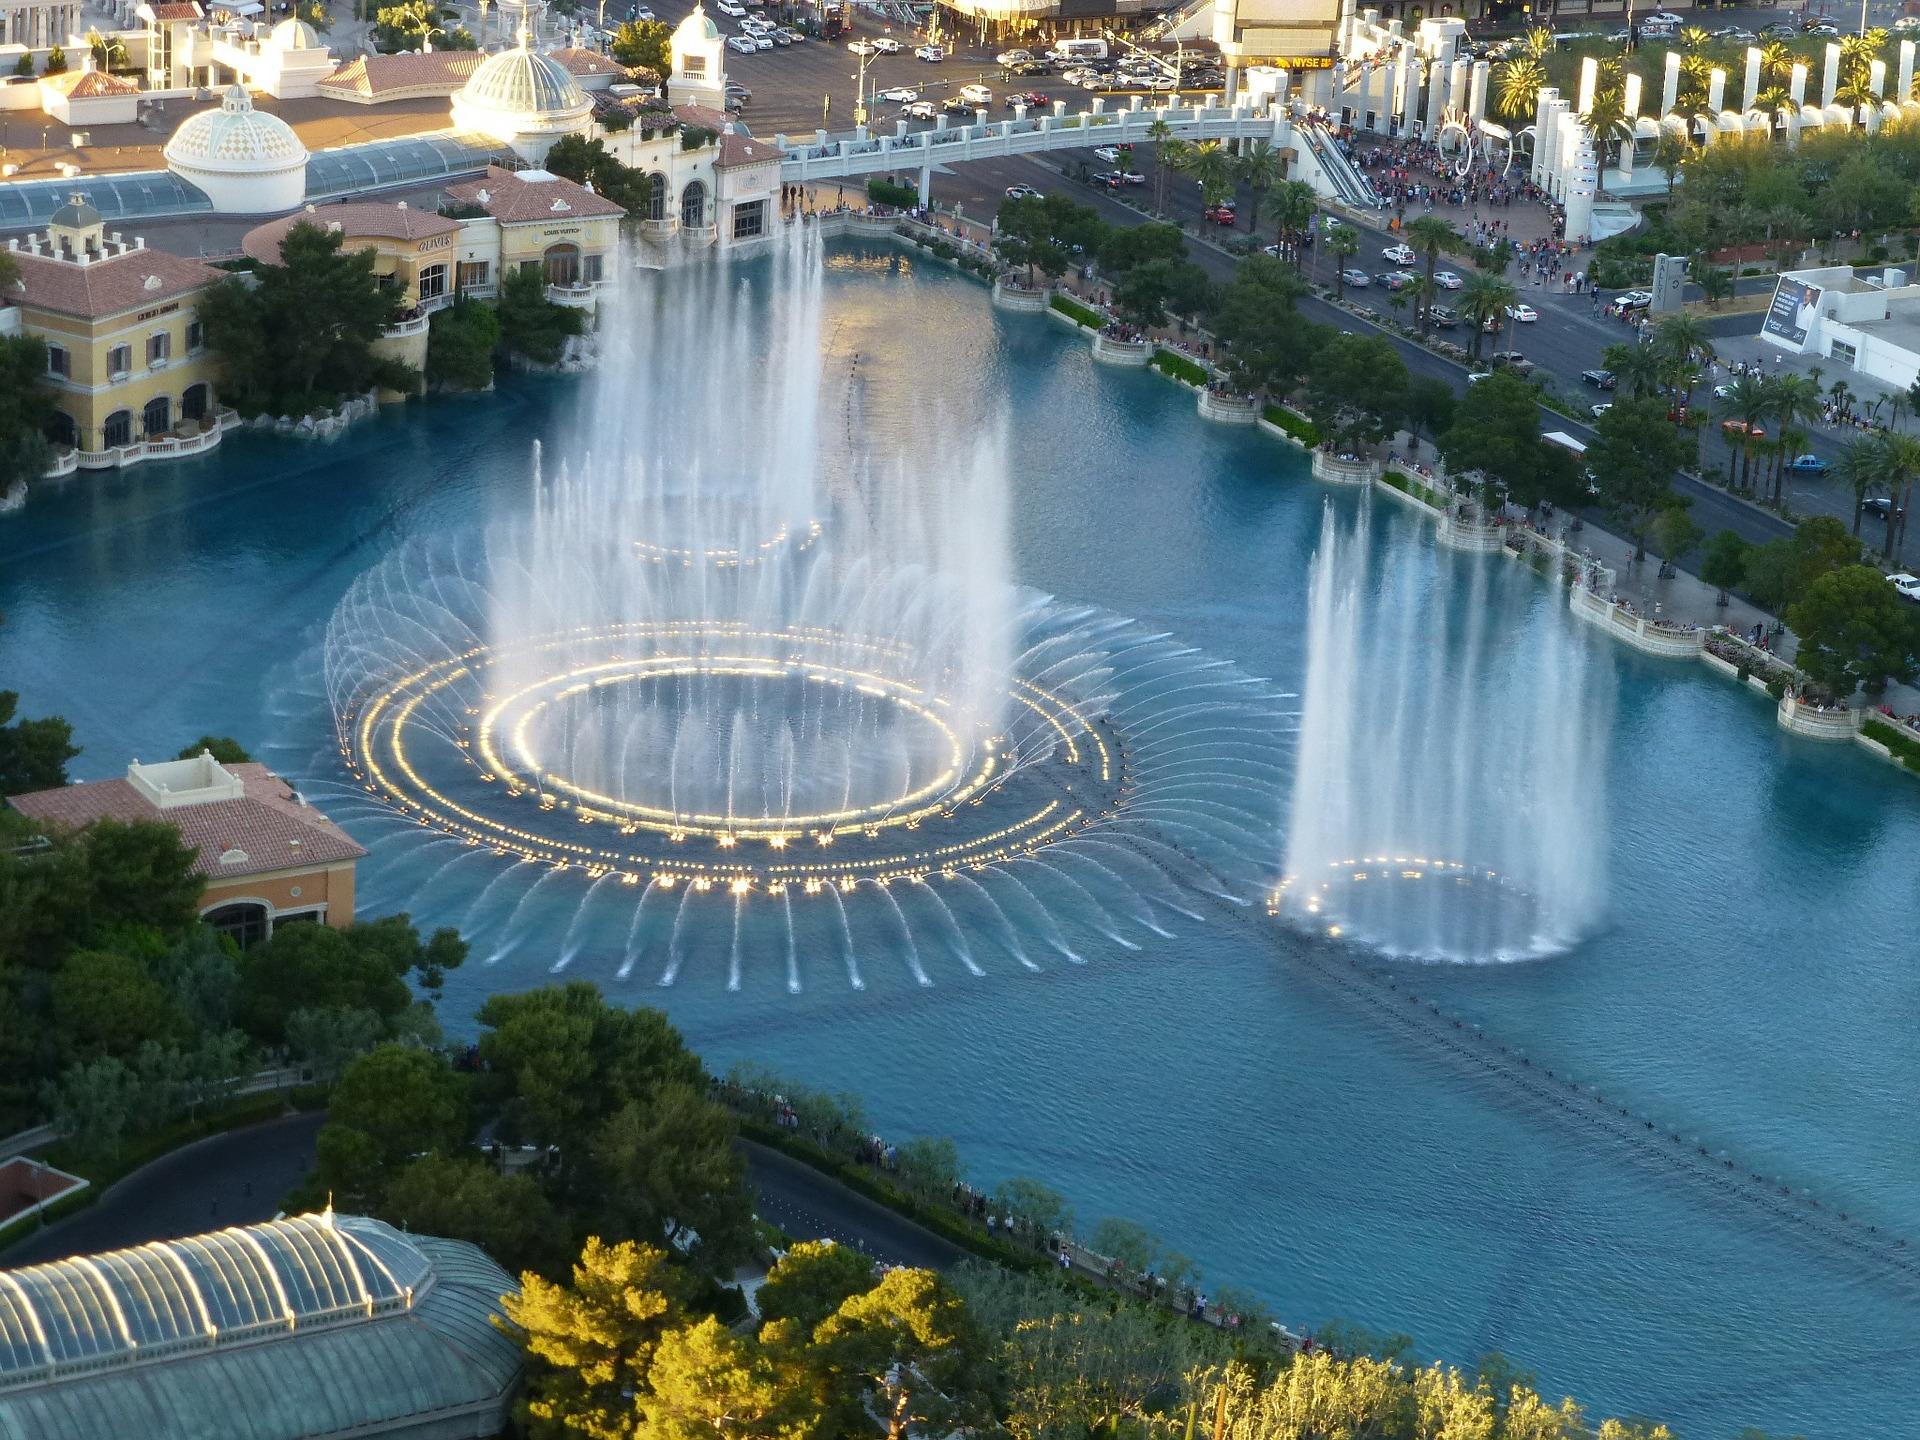 The Las Vegas Water Fountain